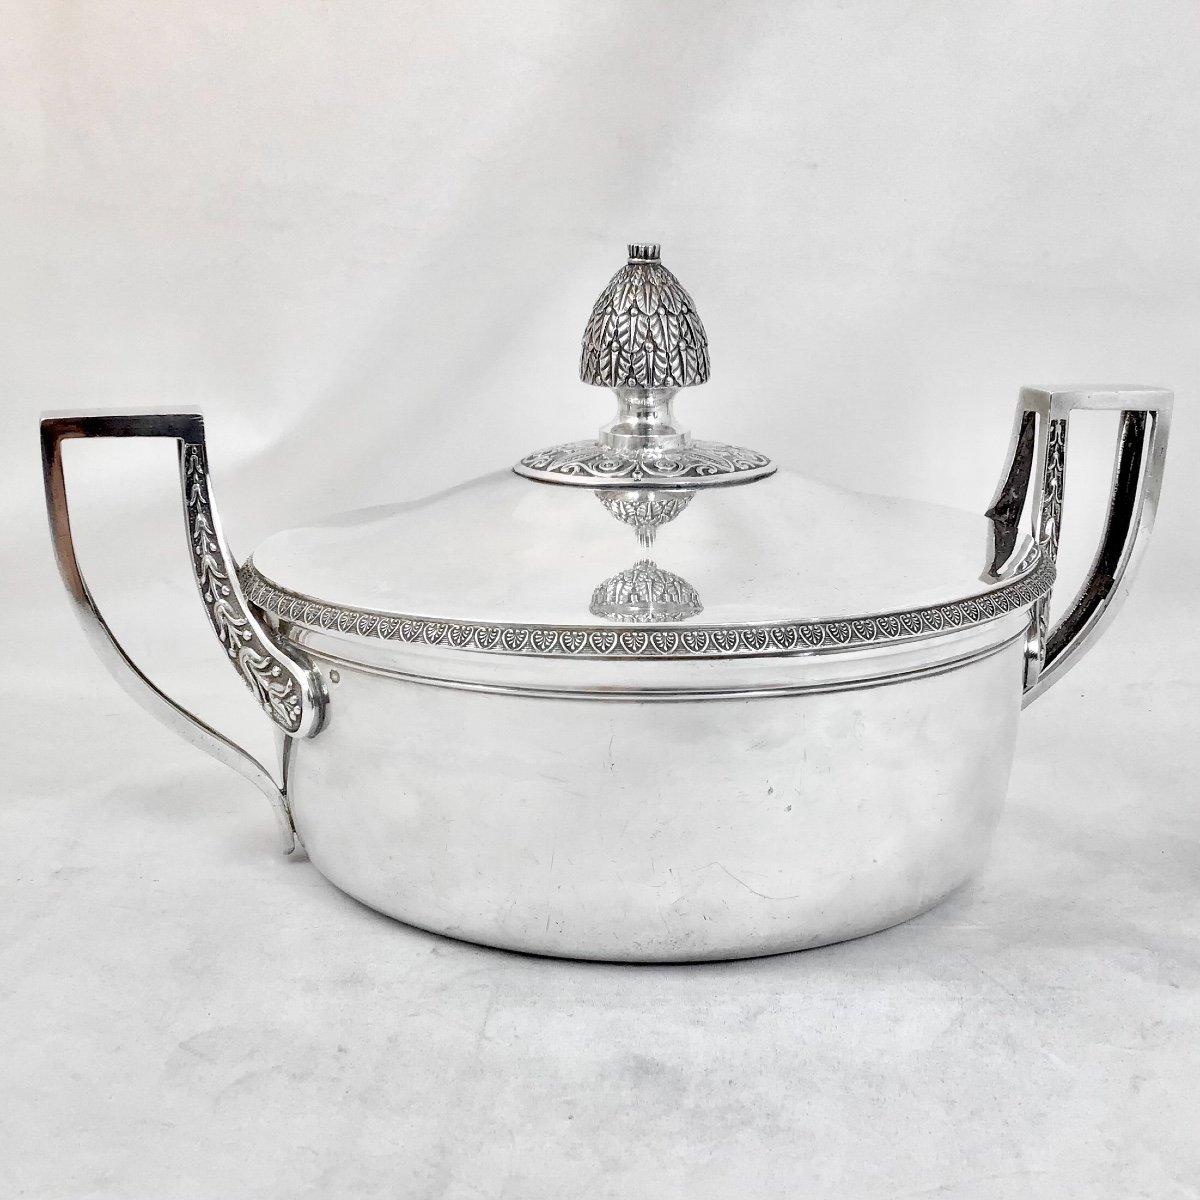 Sterling Silver Vegetable Dish, Empire Period, Paris 1809-1819, J.-b. Lefranc-photo-6